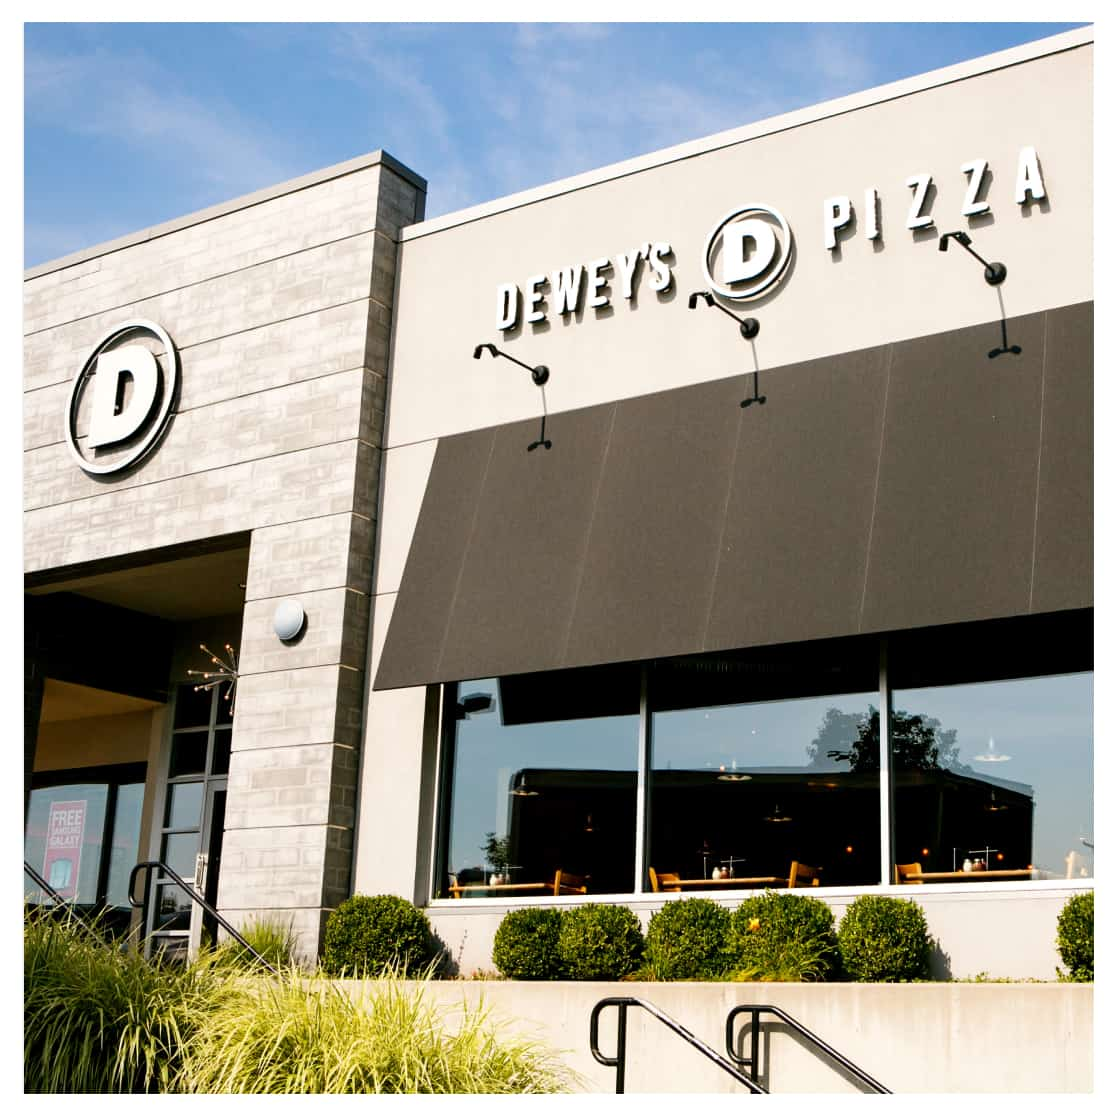 Deweys Pizza Restaurant using Thanx